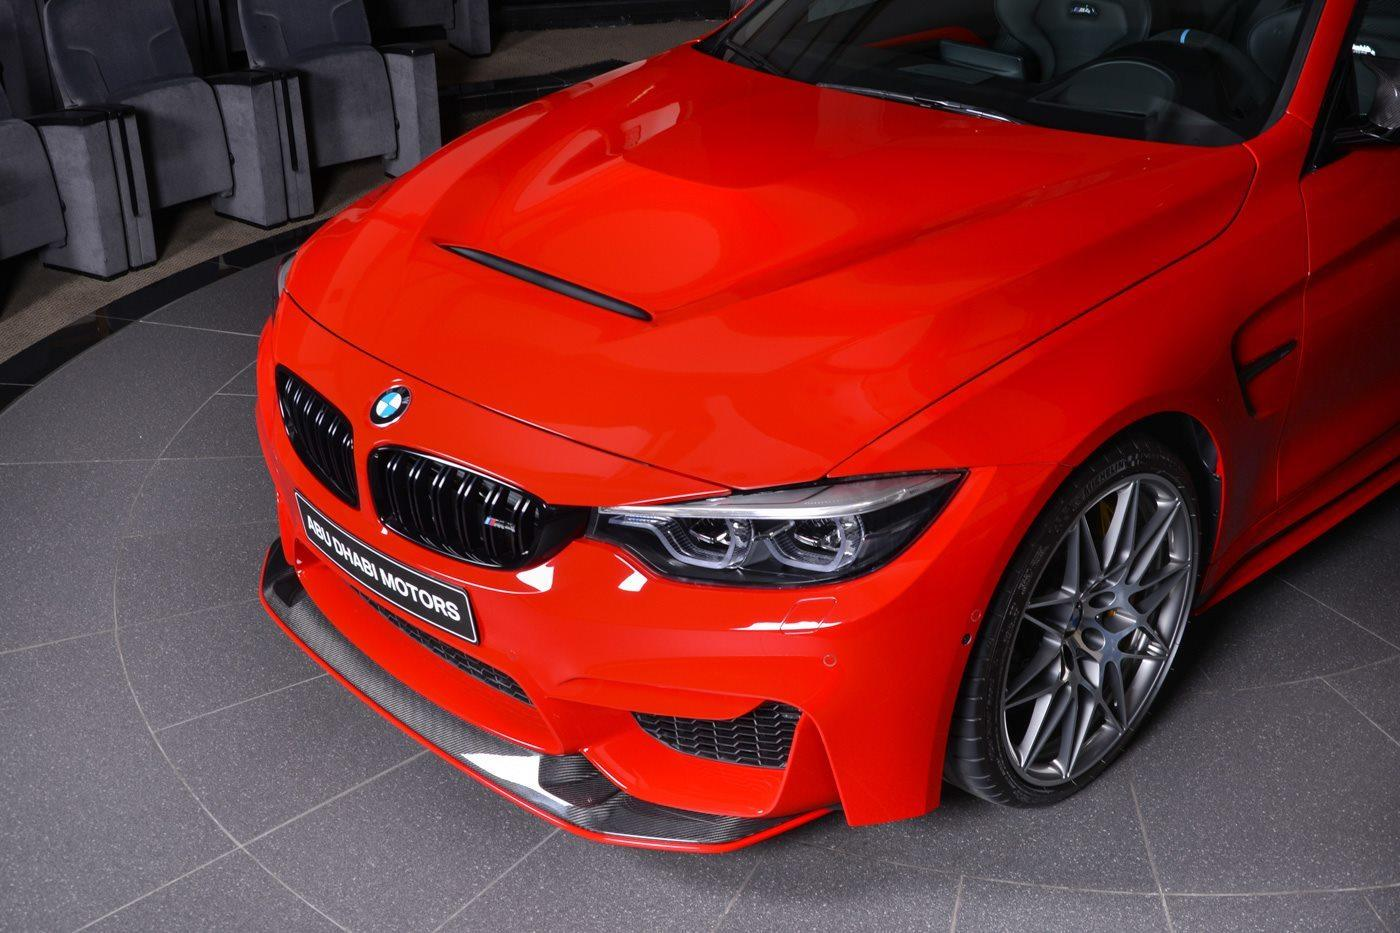 Este Bmw M4 Rojo Ferrari Quiere Que Te Olvides Del Yas